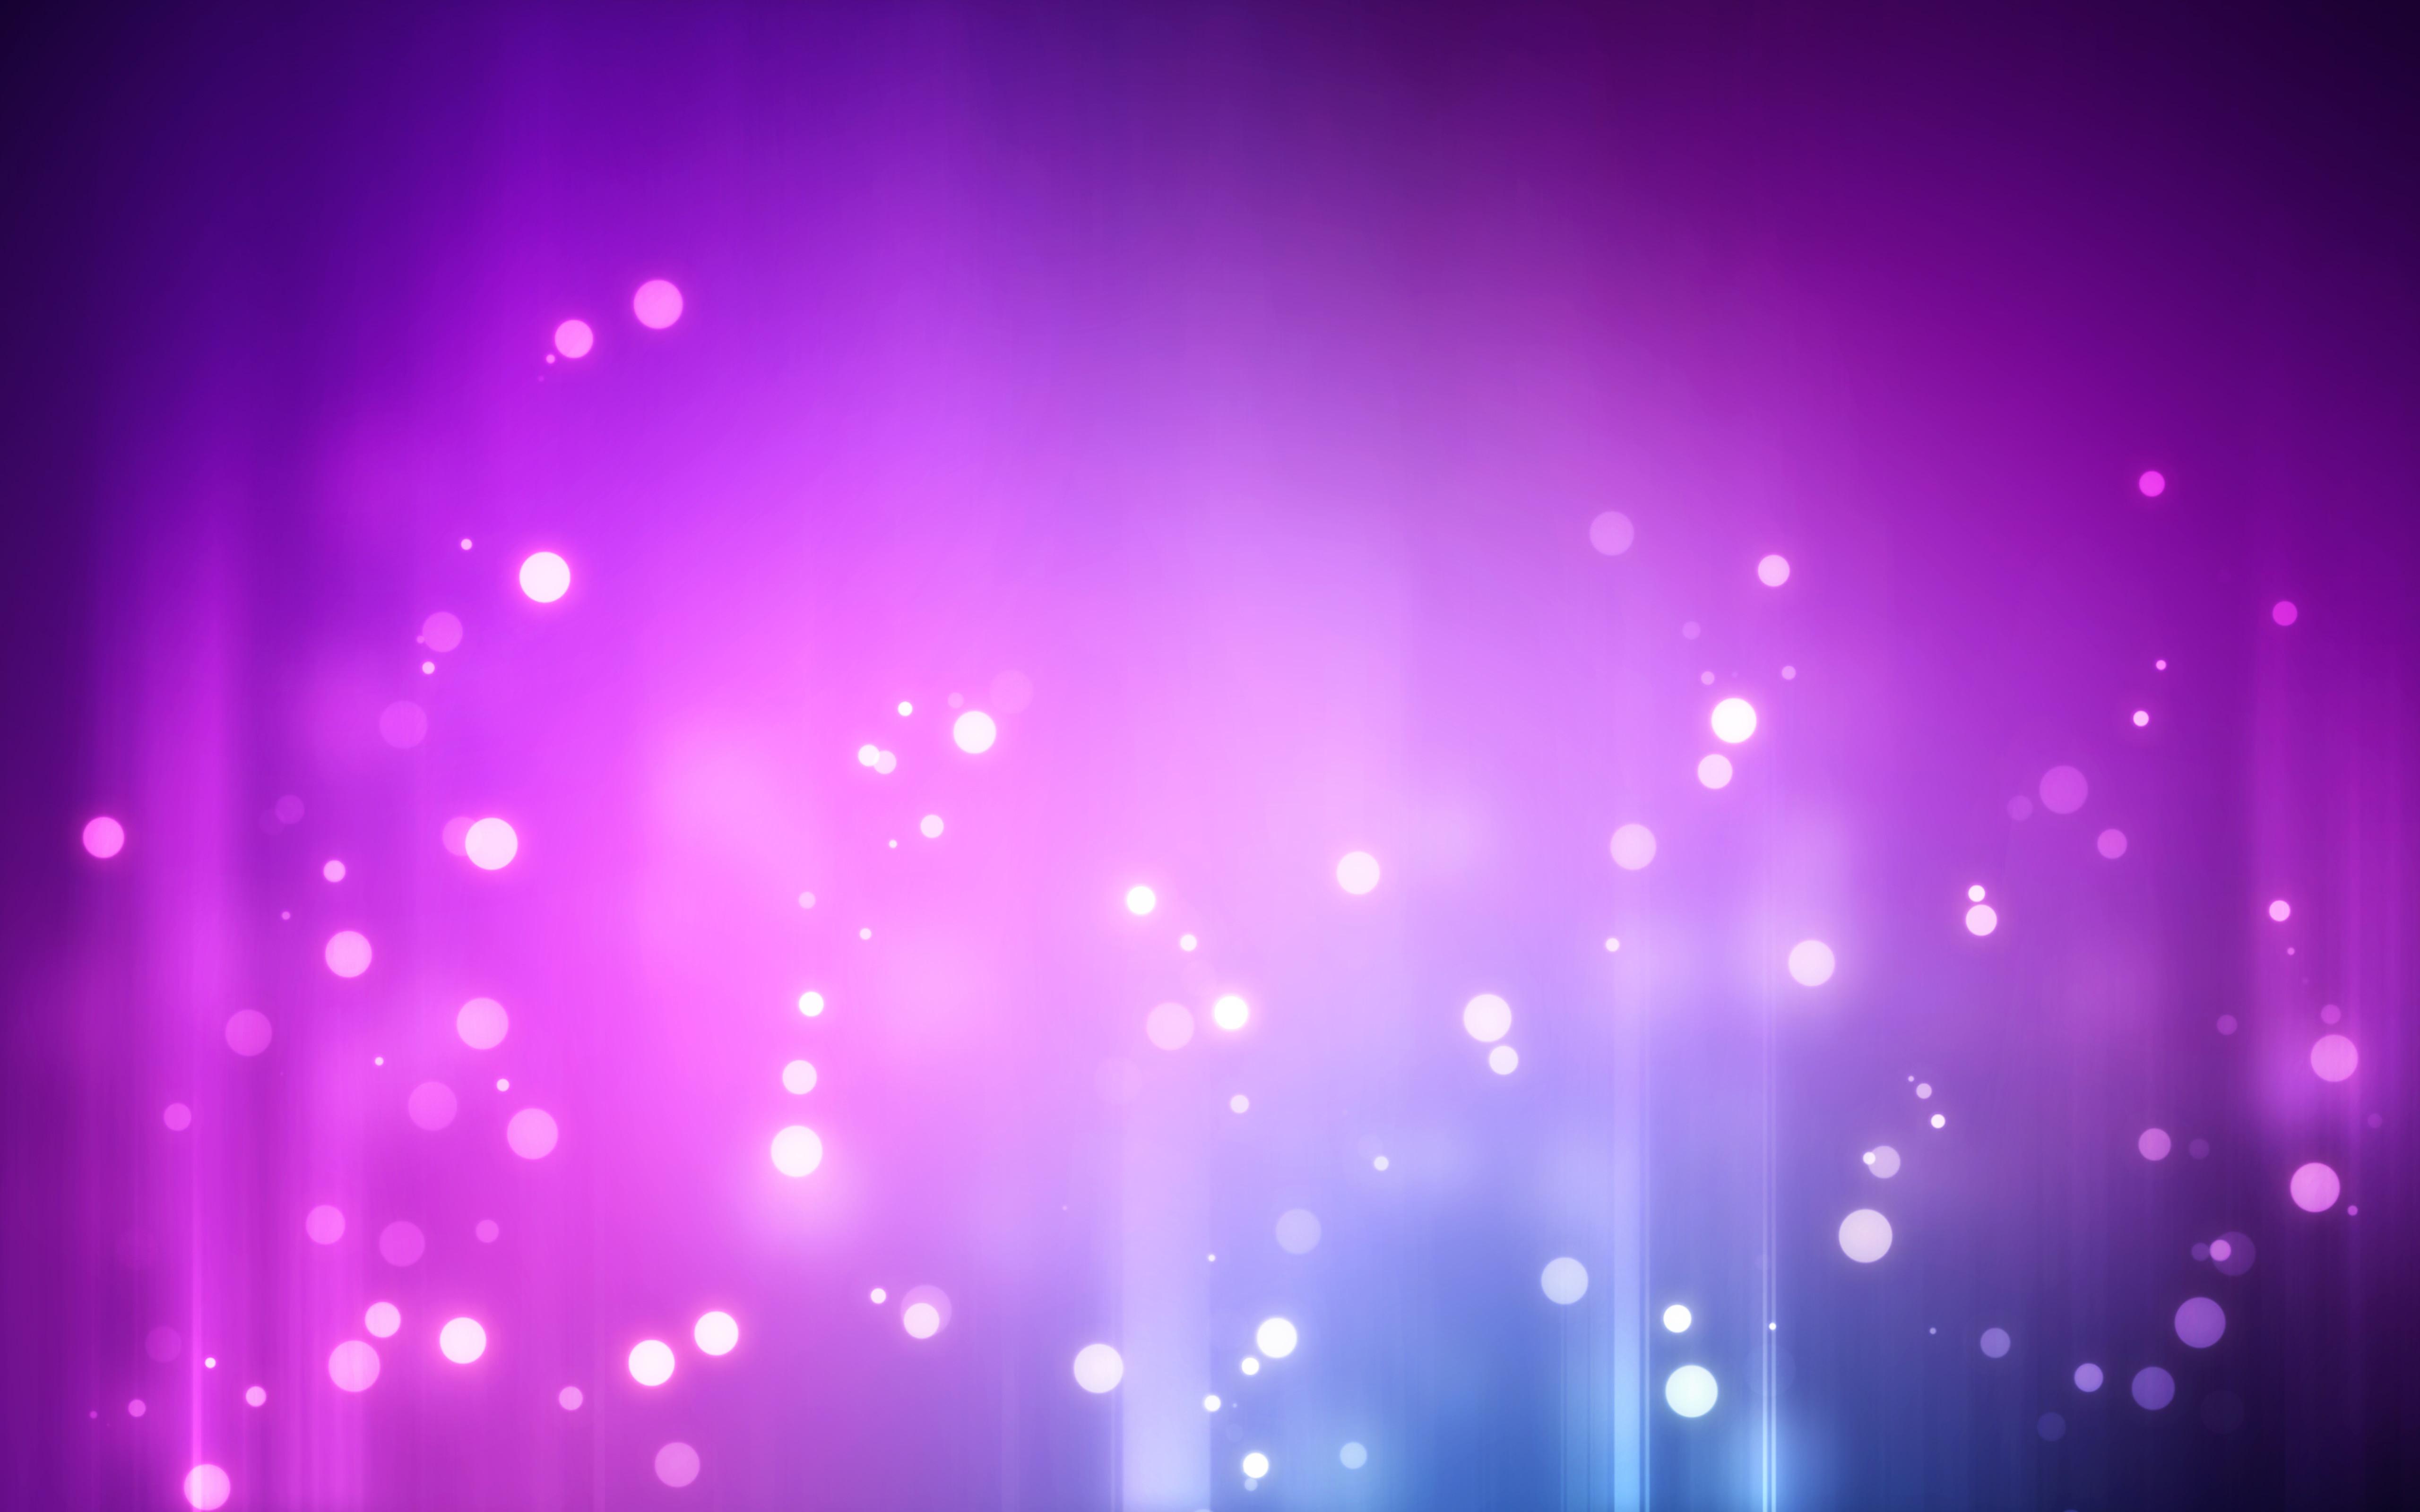 Abstract purple wallpaper - magic light